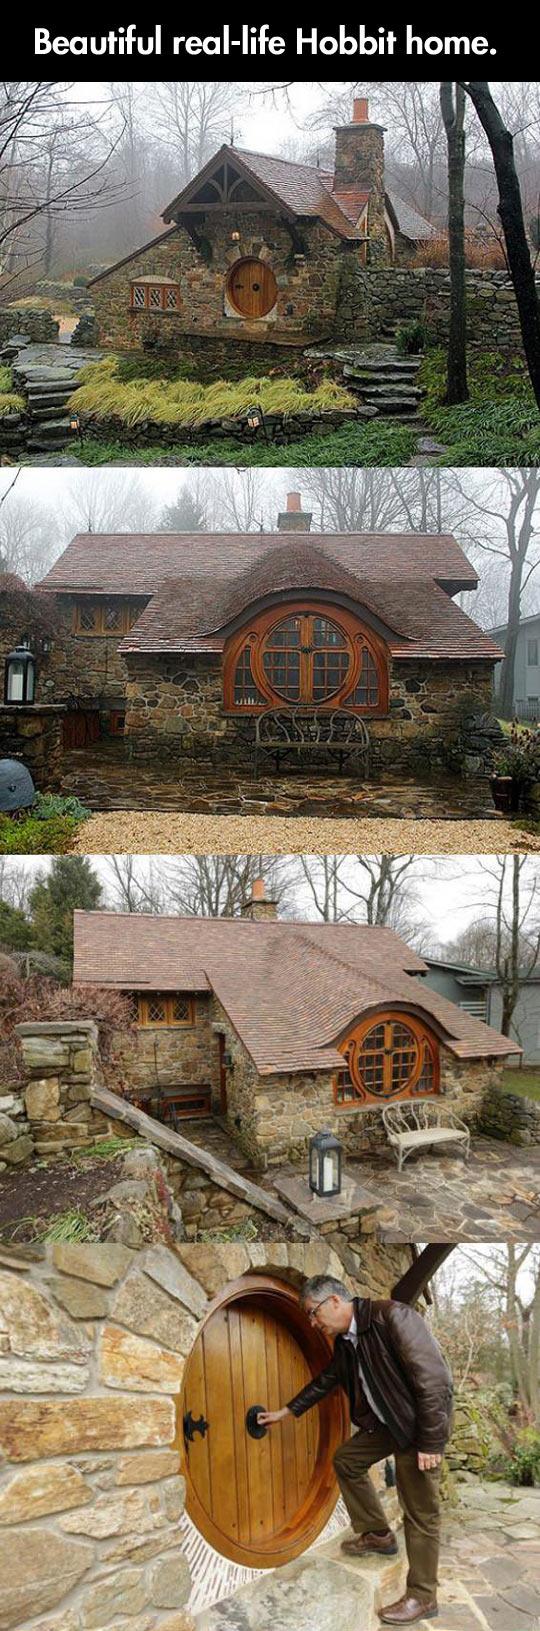 real life hobbit home